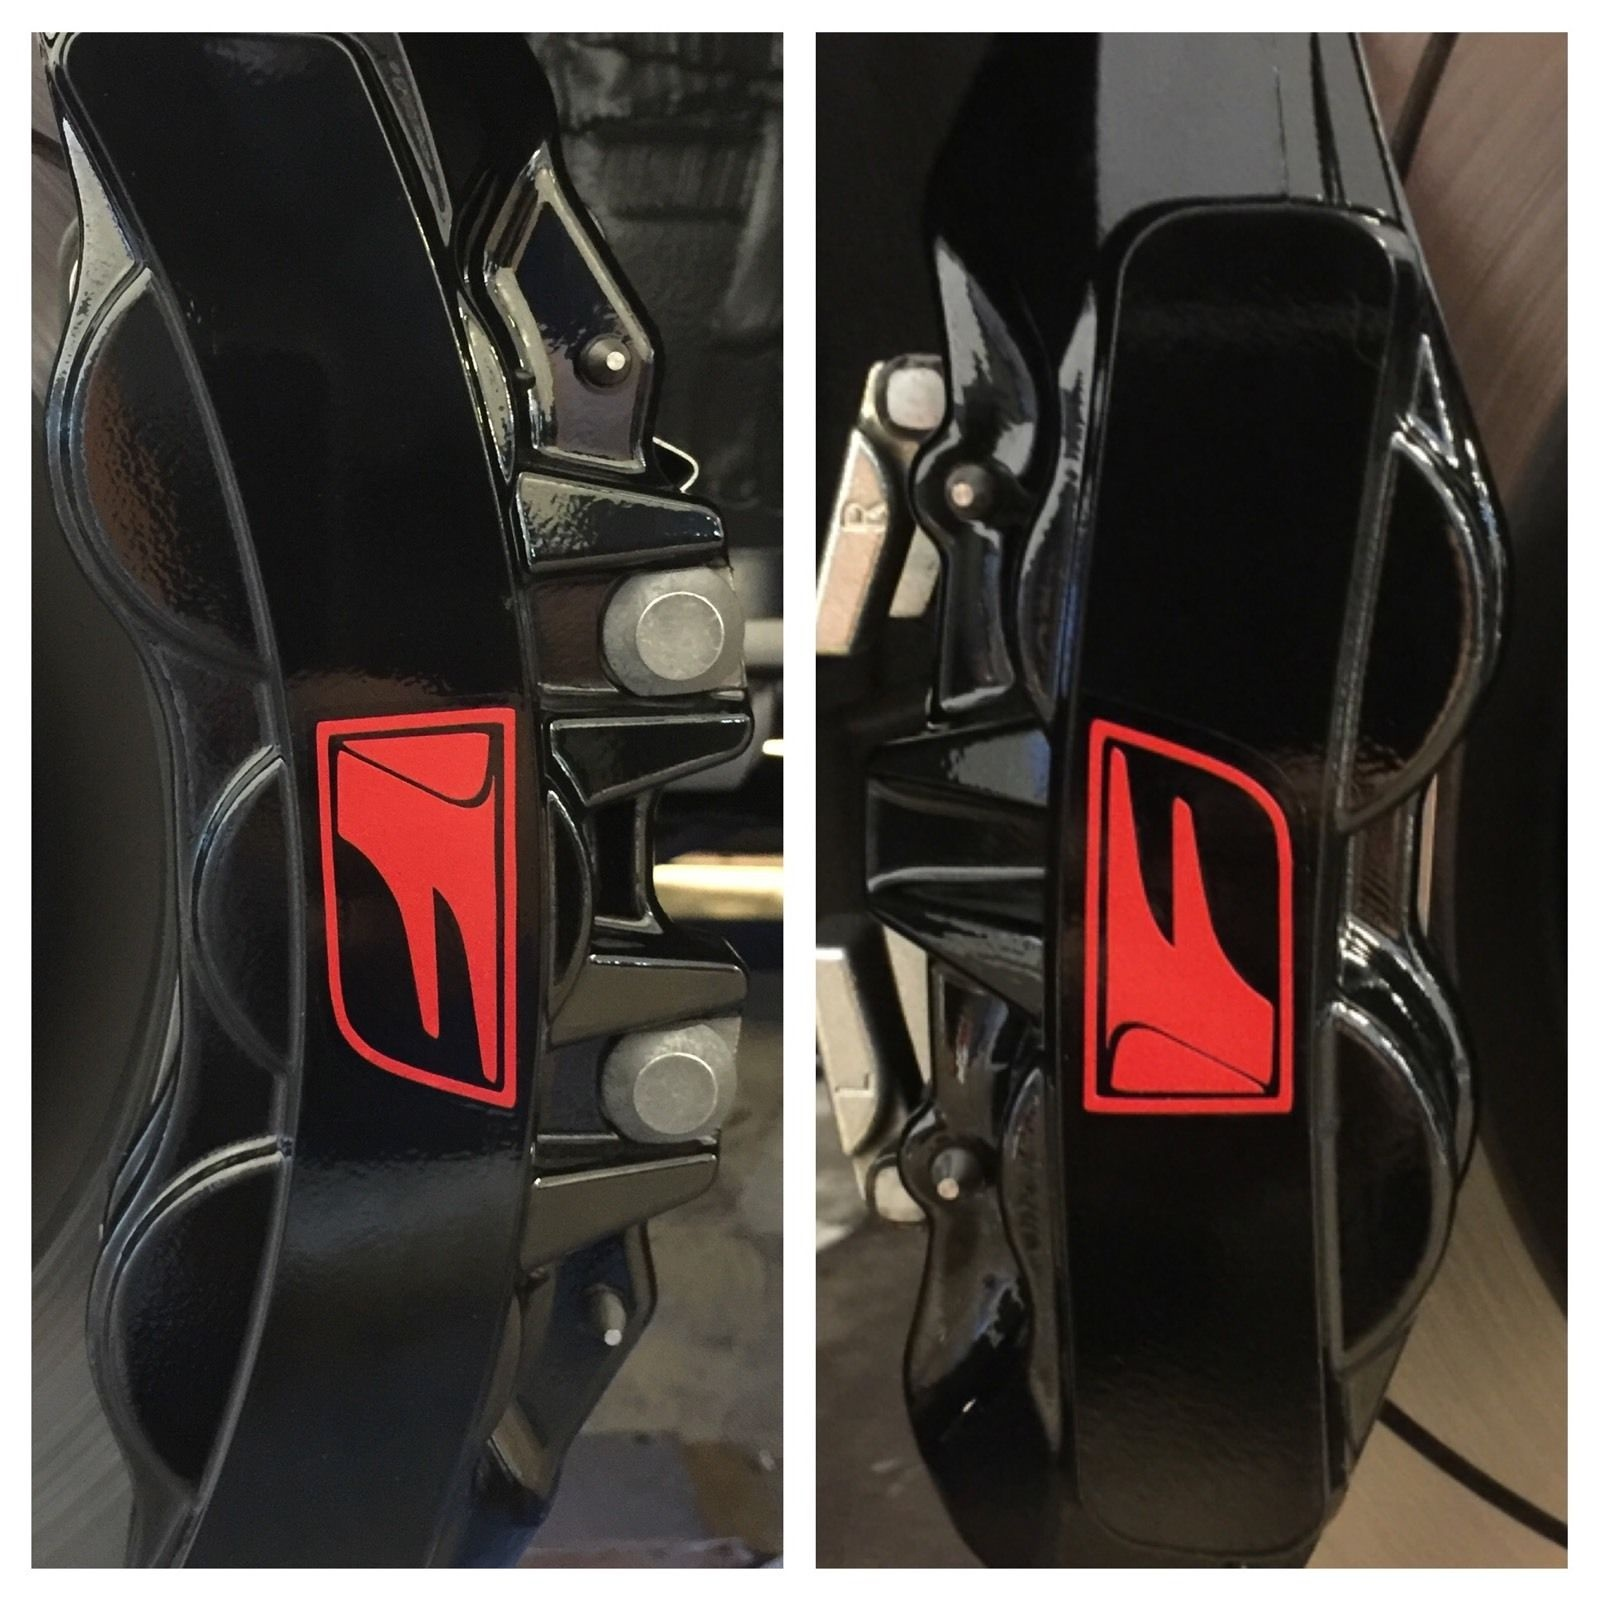 For 8pc 2016 Lexus Gs F Brake Caliper Vinyl Sticker Decal